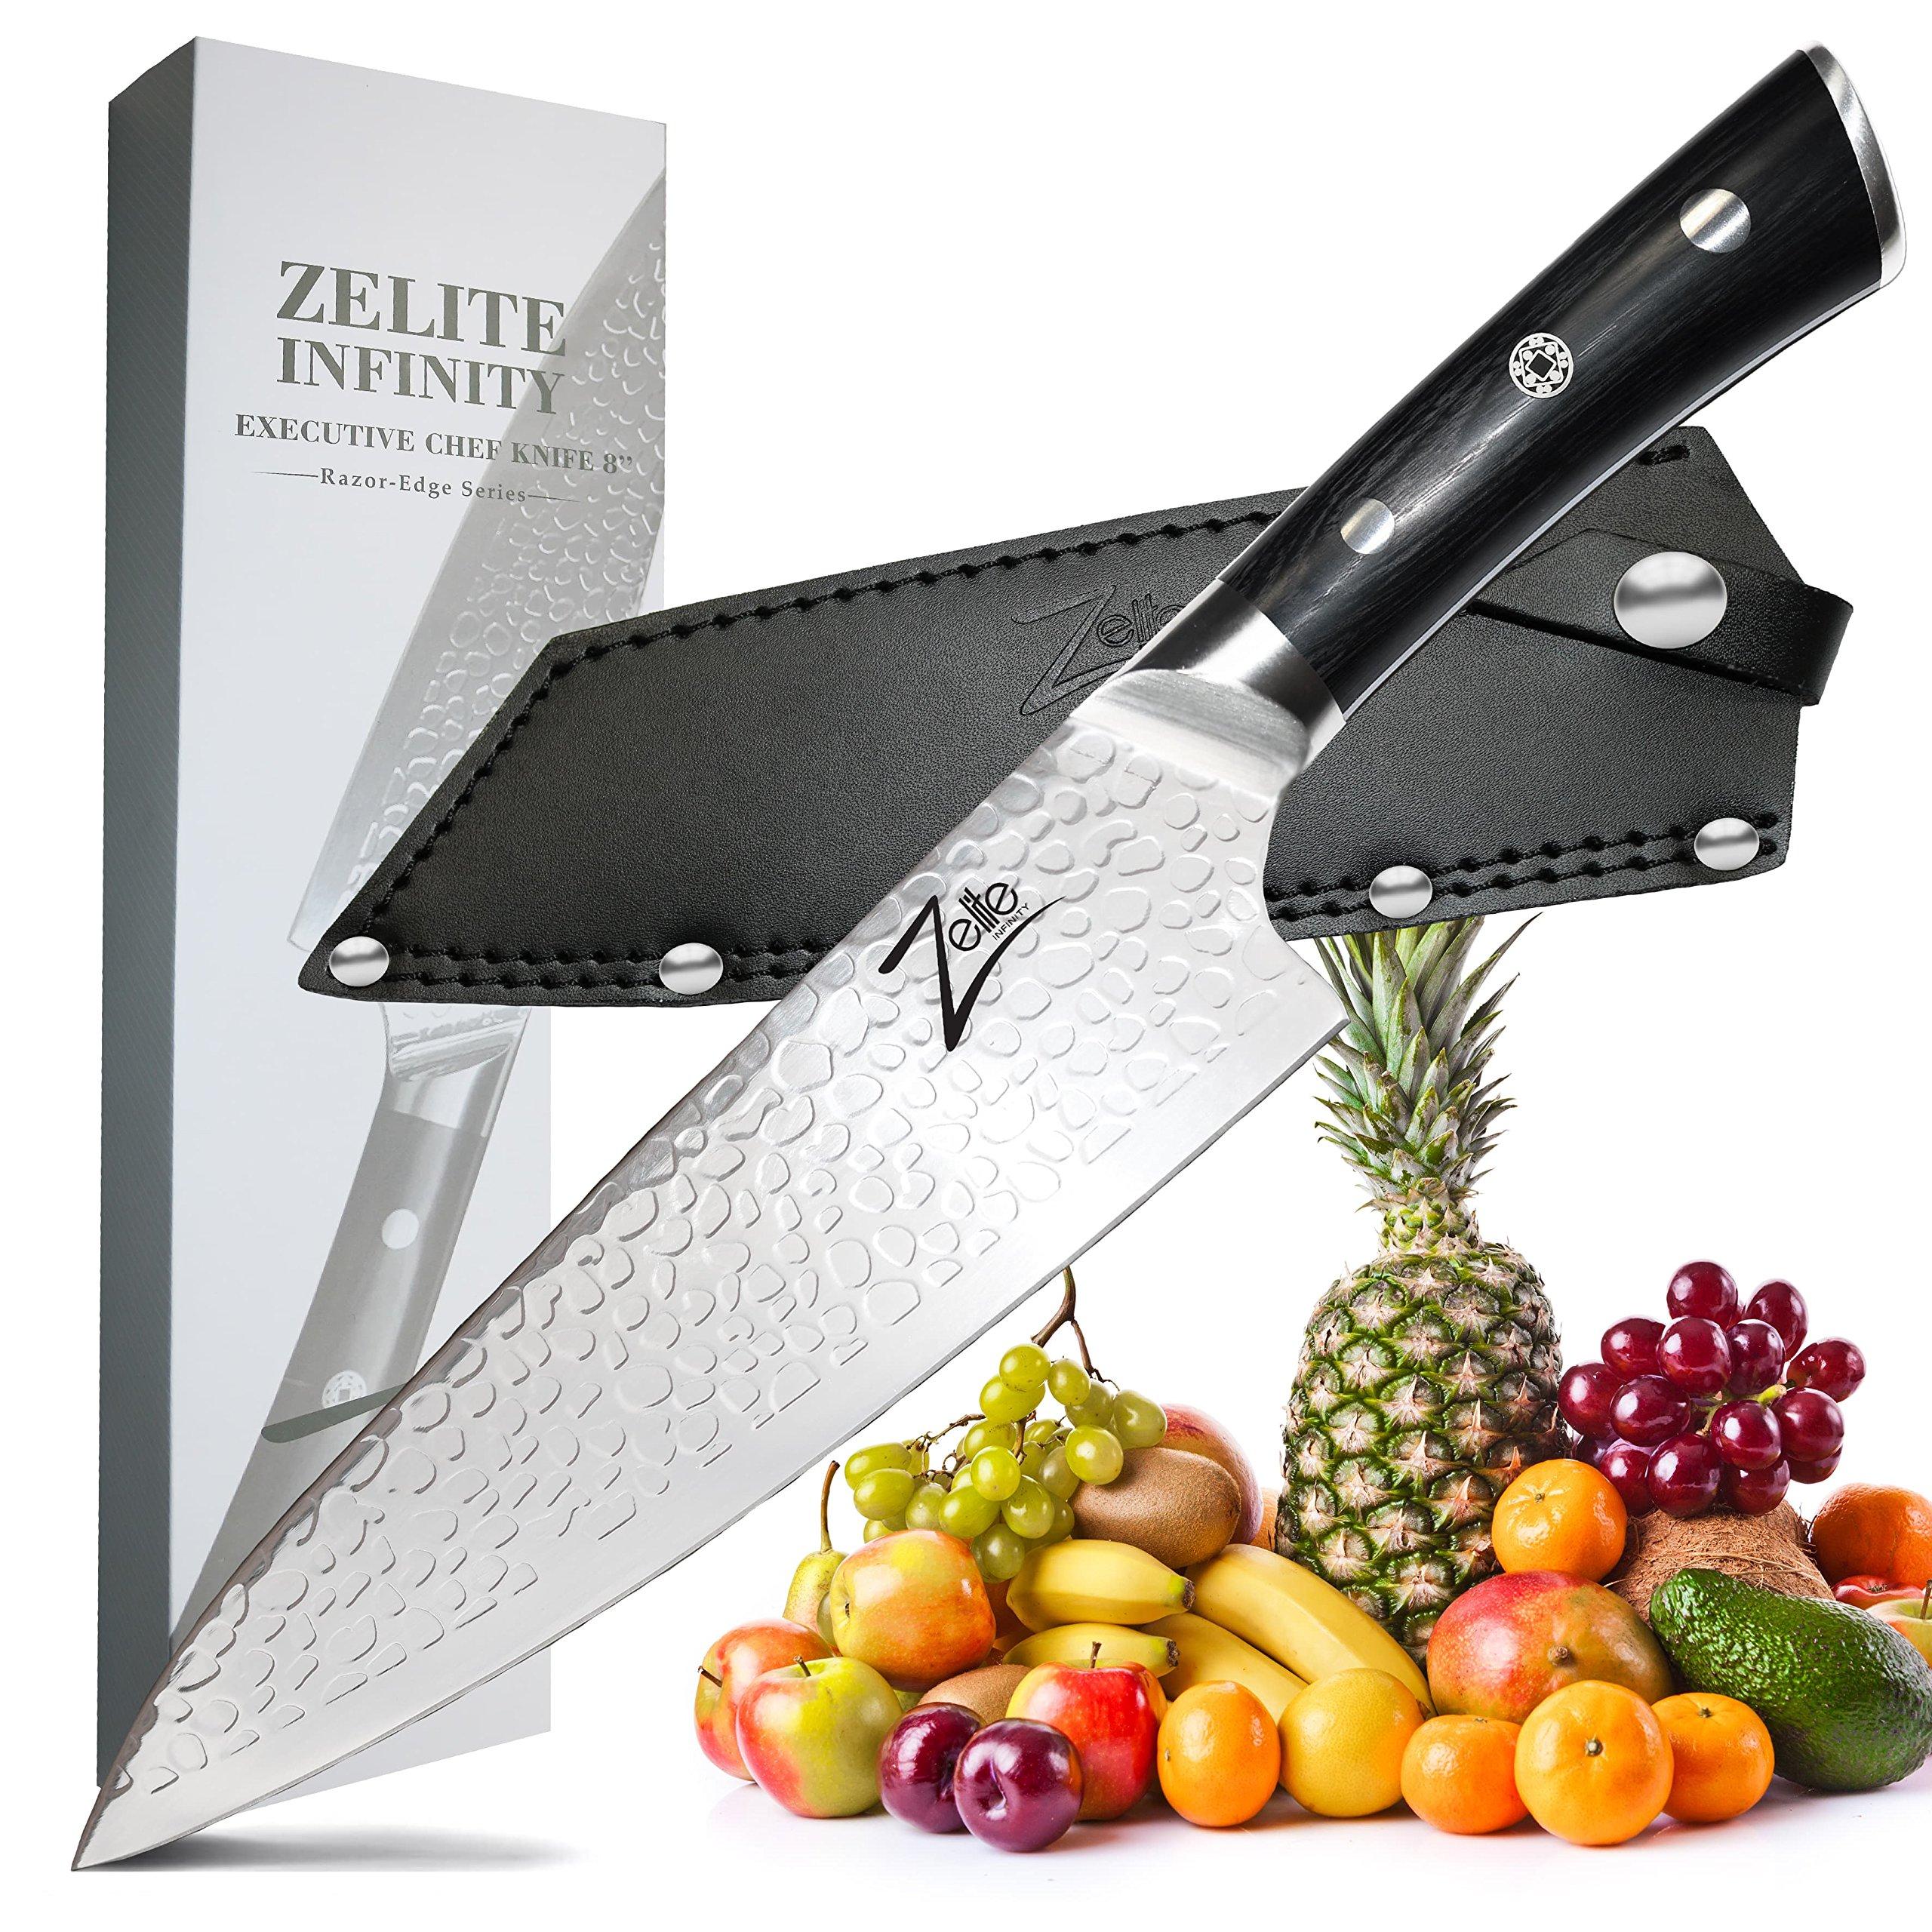 ZELITE INFINITY Executive Chef Knife 8 Inch >> Razor-Edge Series >> Japanese AUS8 High Carbon Stainless Steel, Black Pakkawood Handle, STORM-X Finish, Deep Chefs Blade, Ultra-Premium Leather Sheath